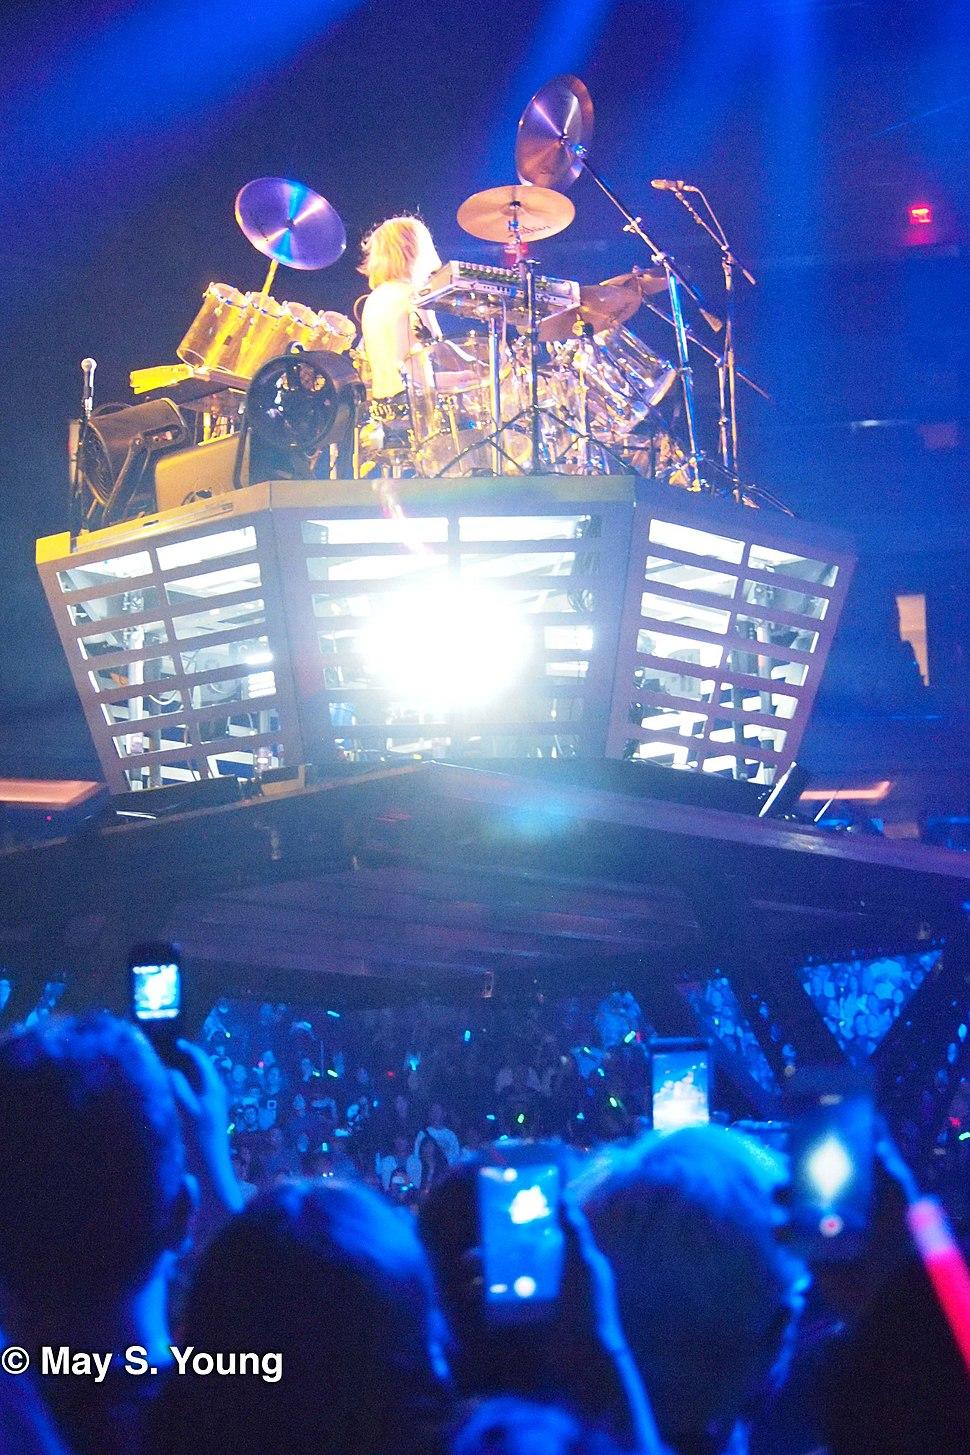 Yoshiki's drum riser, XJapan MSG 10112014 (15325073010)